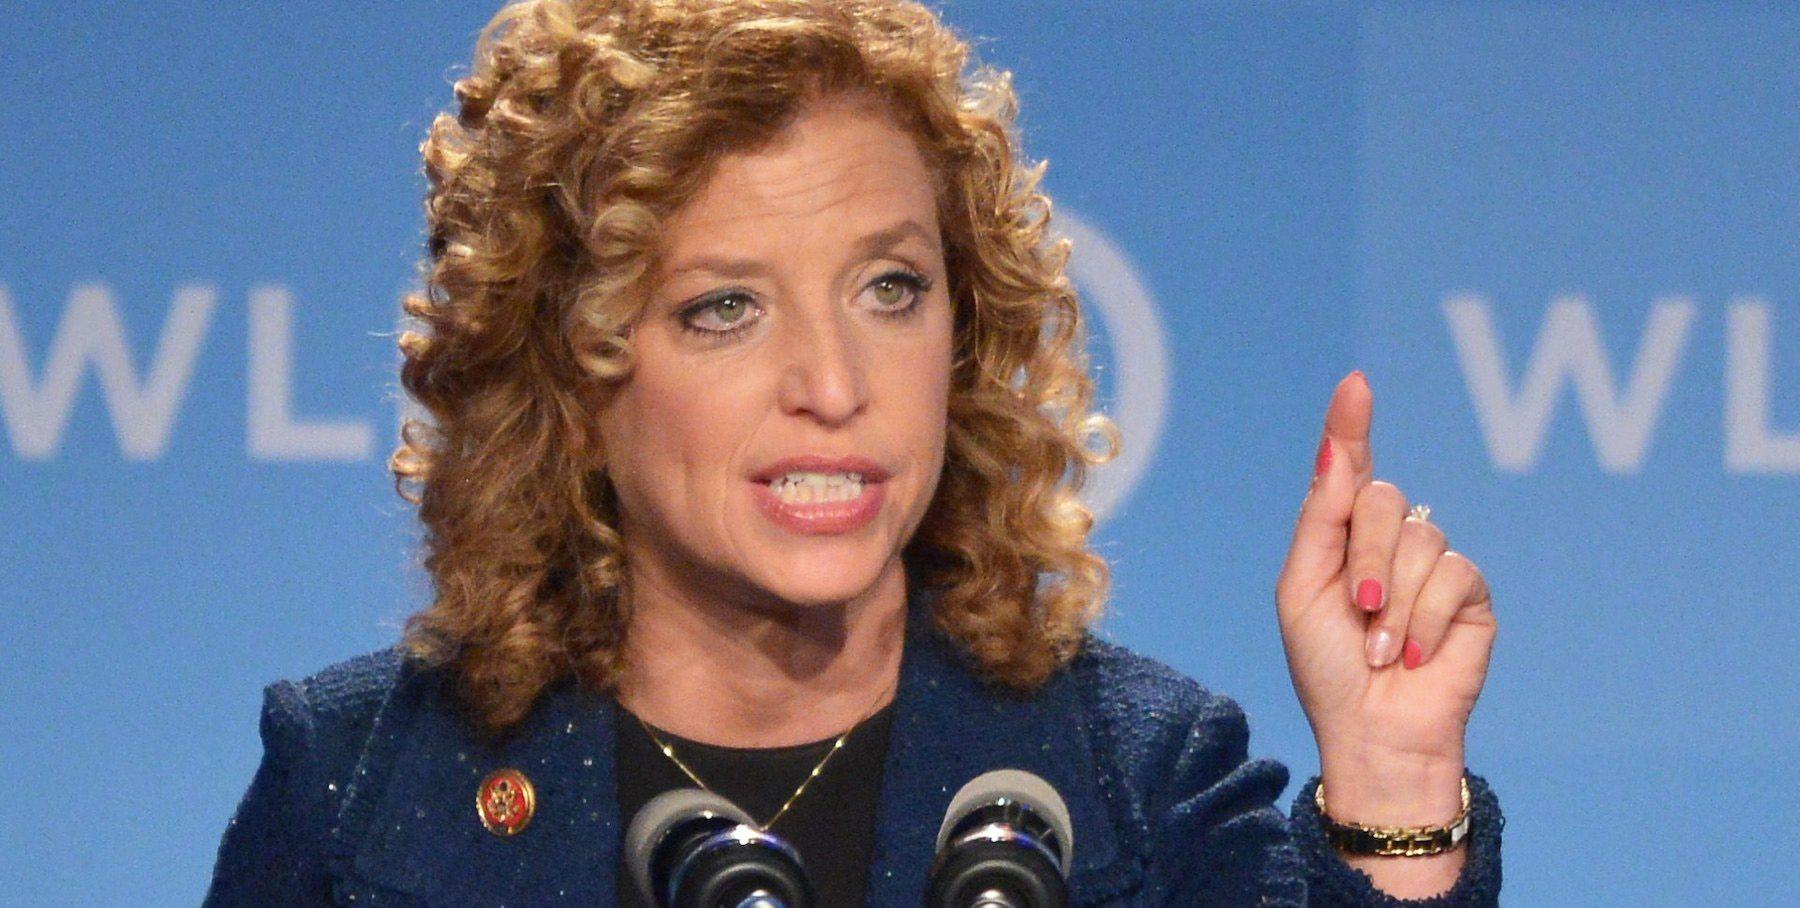 Will Debbie Wasserman Schultz Even Make It to the Convention?